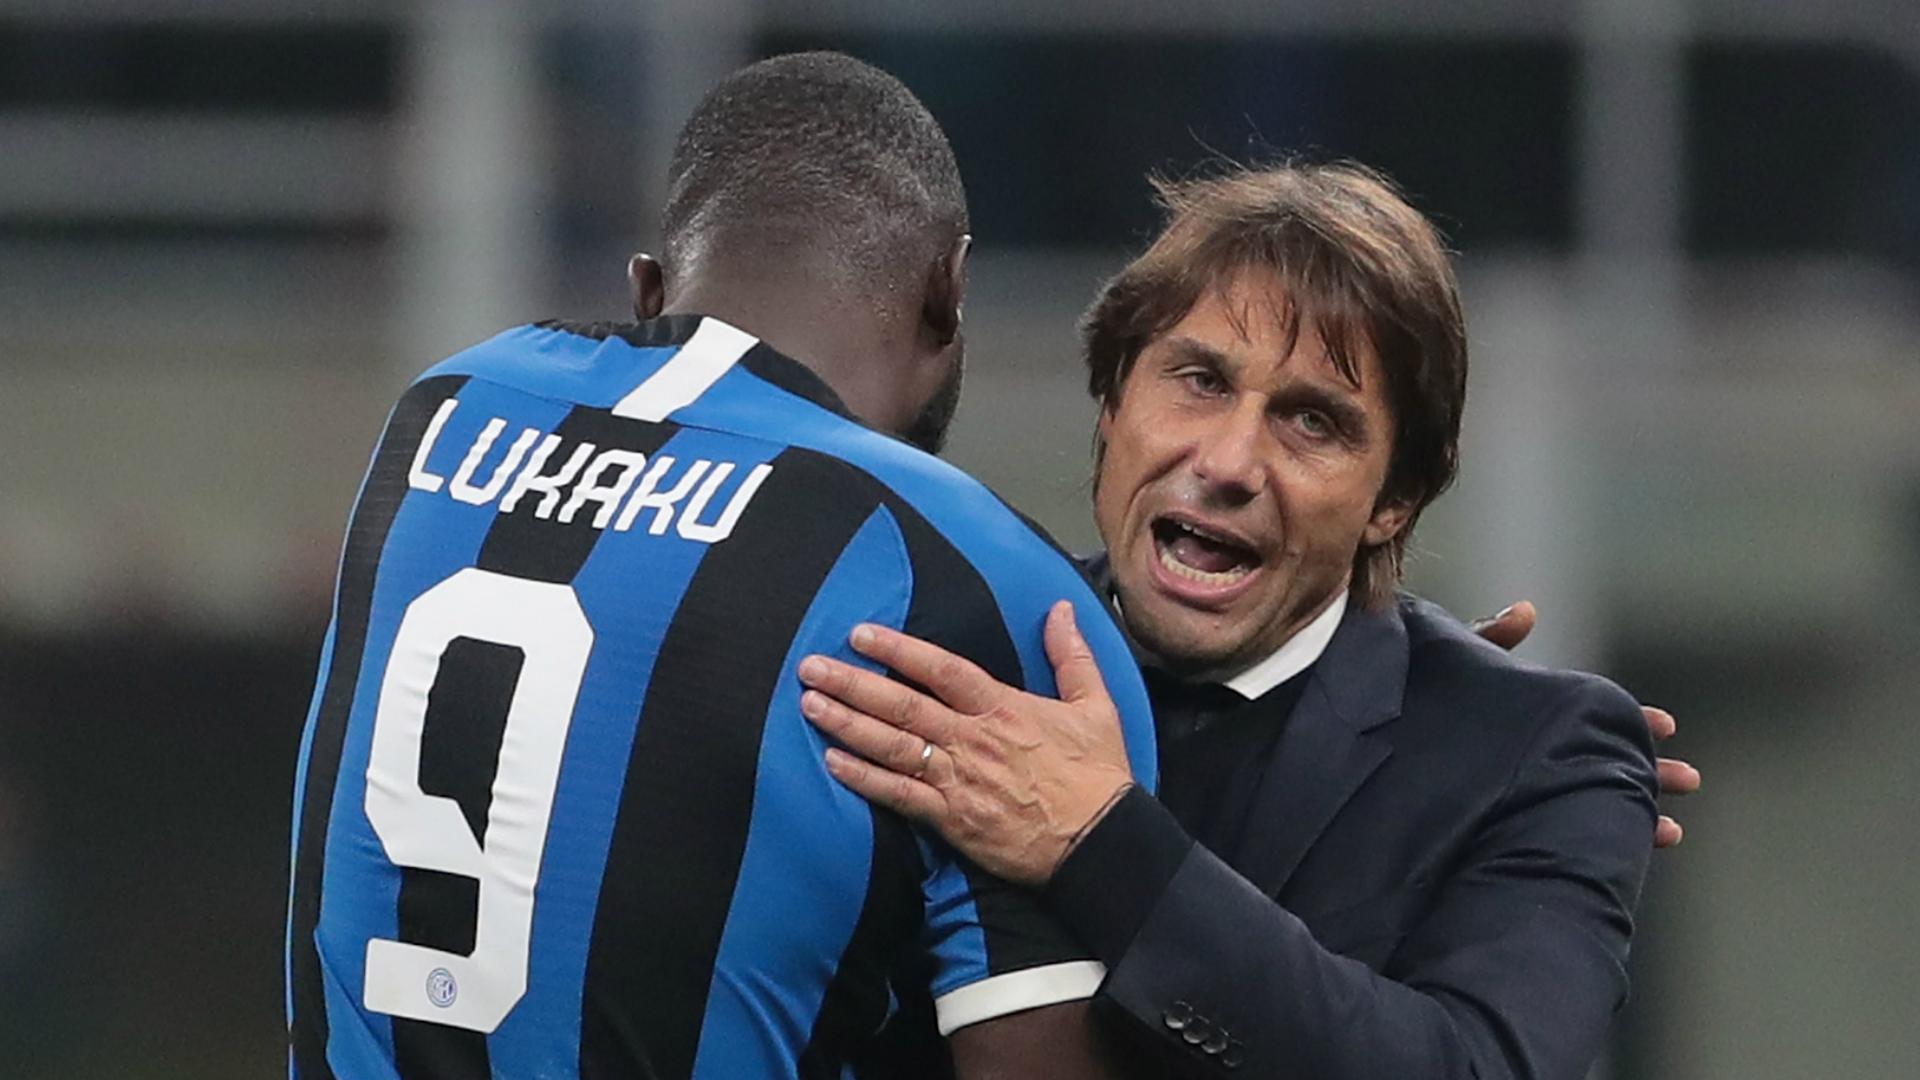 Inter star Lukaku was 'really close' to Juventus move